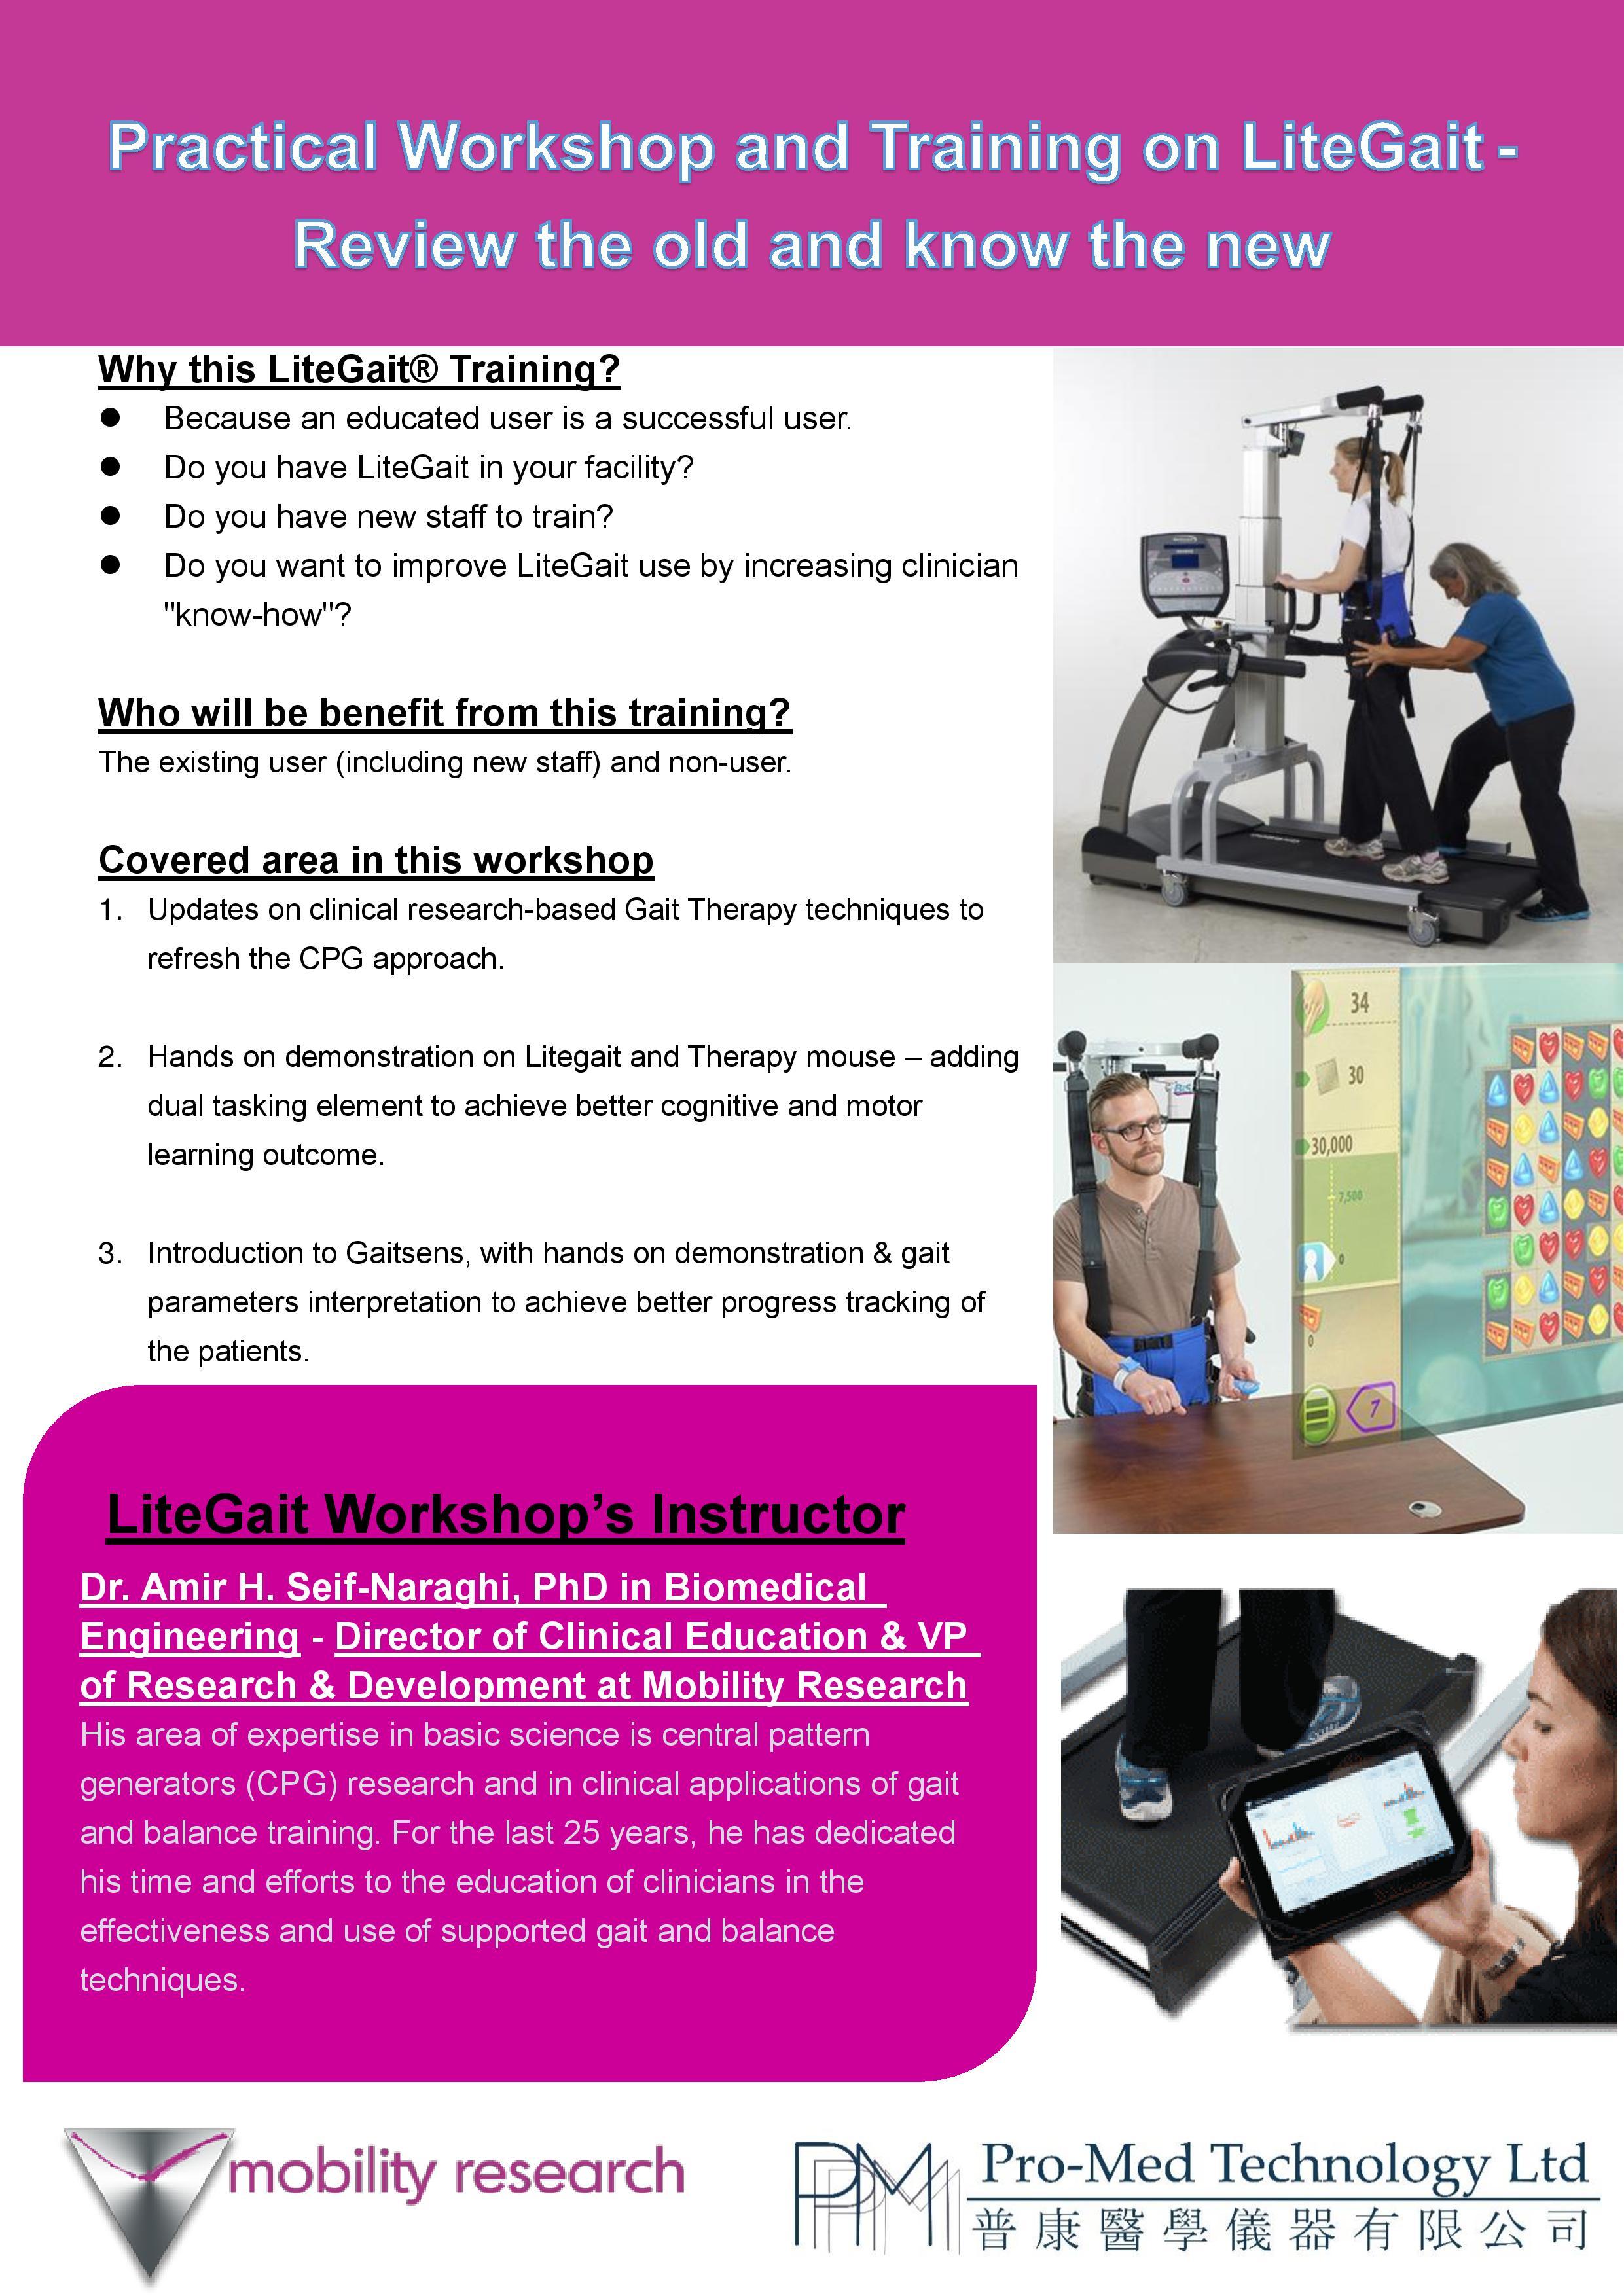 Practical Workshop and Training on LiteGait-page-001